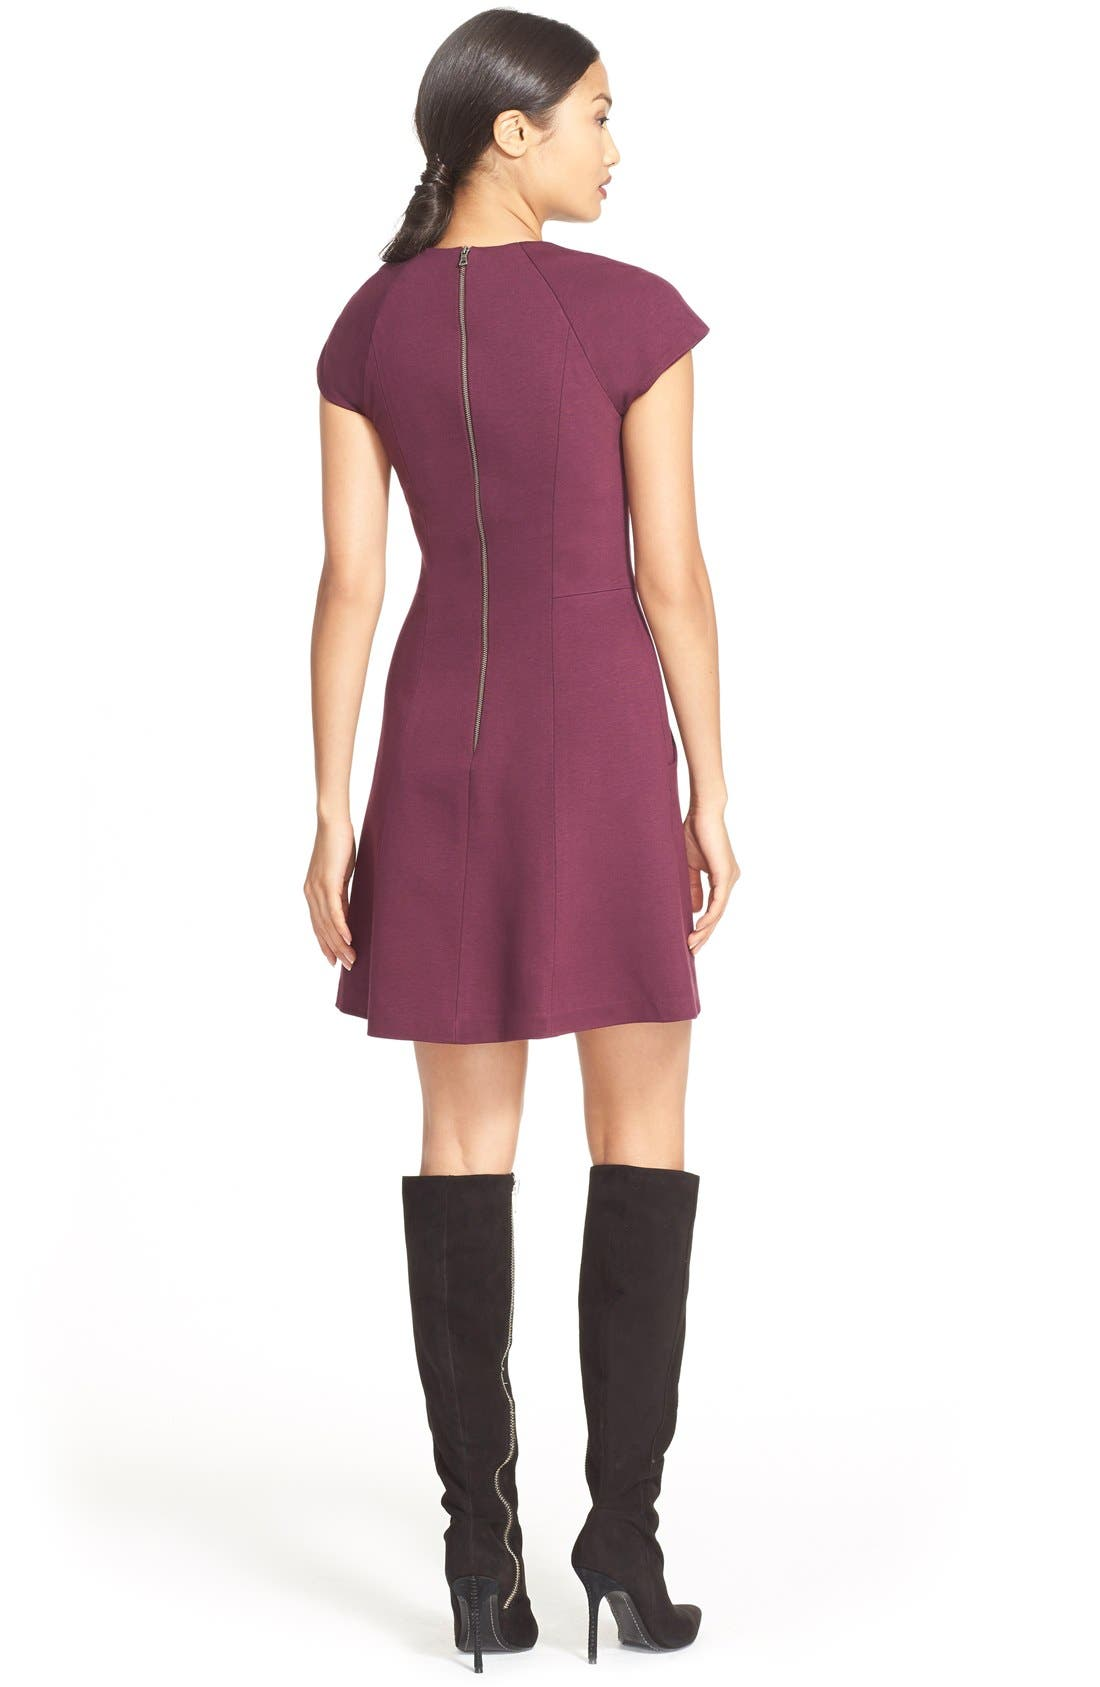 ALICE + OLIVIA,                             'Reanne' Fit & Flare Dress,                             Alternate thumbnail 2, color,                             502